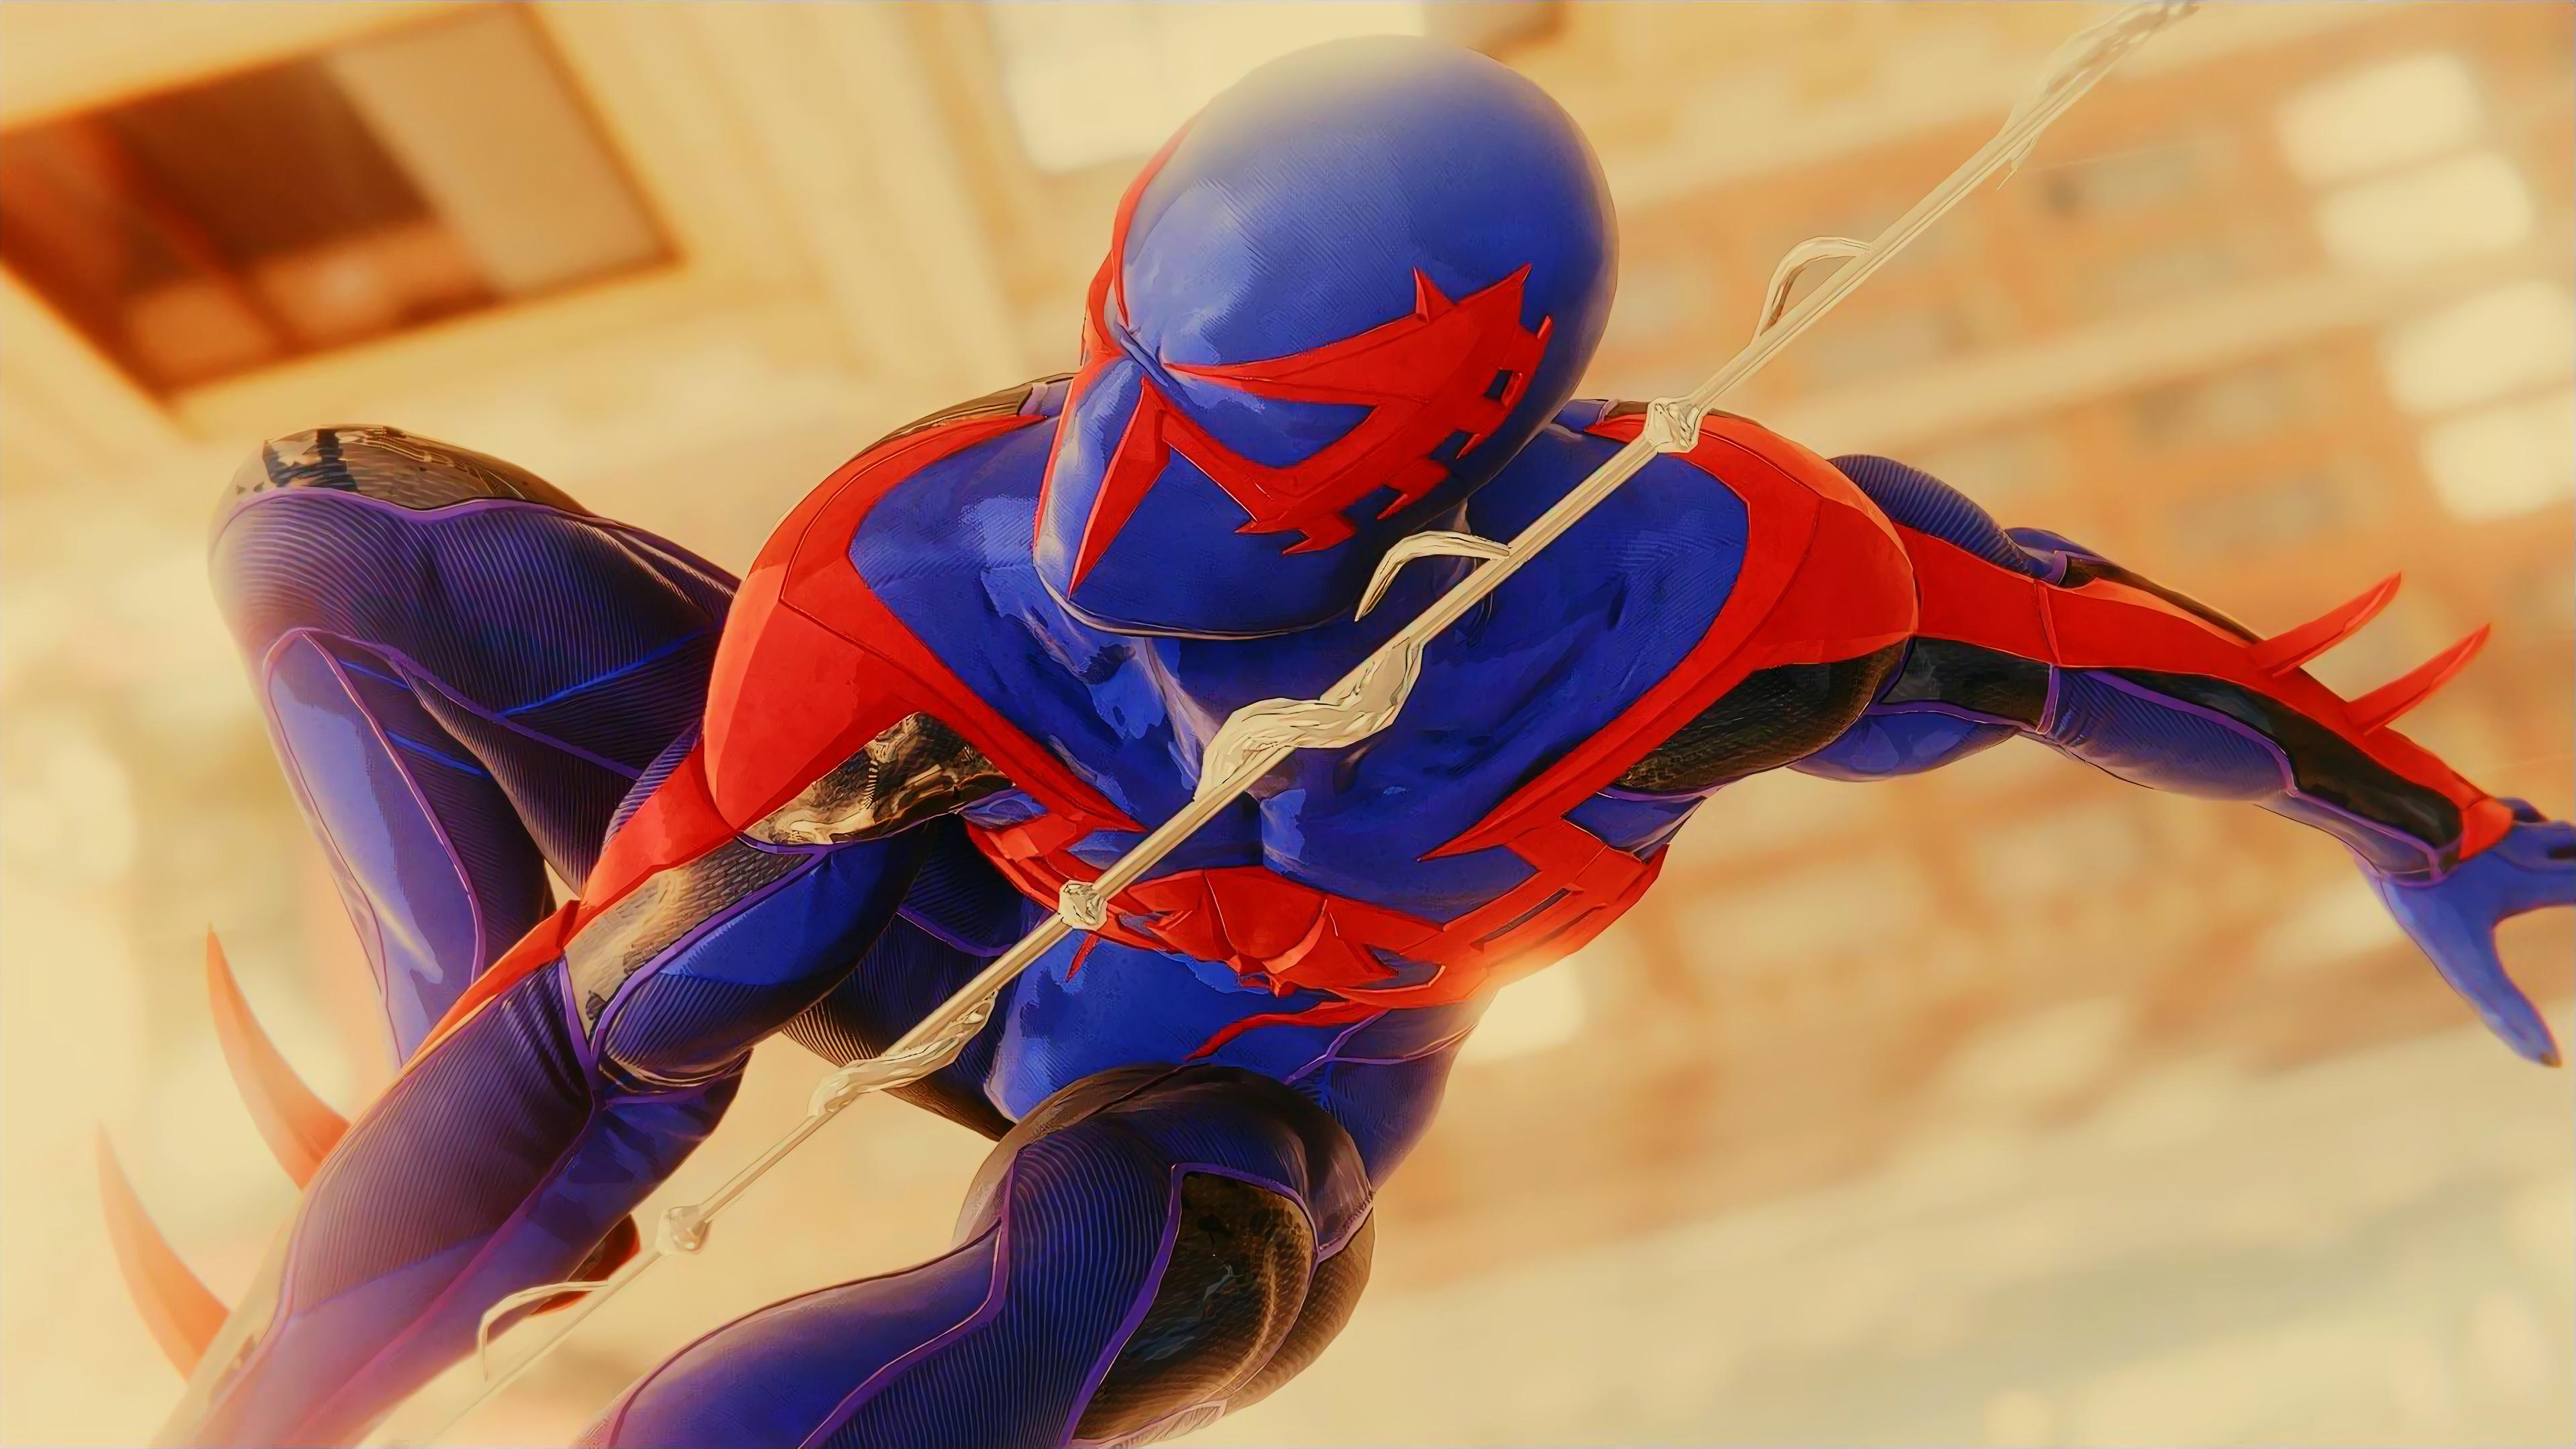 spiderman ps4 2099 4k spider wallpapers background laptop backgrounds games 8k wall ps marvel hulk venom hdqwalls